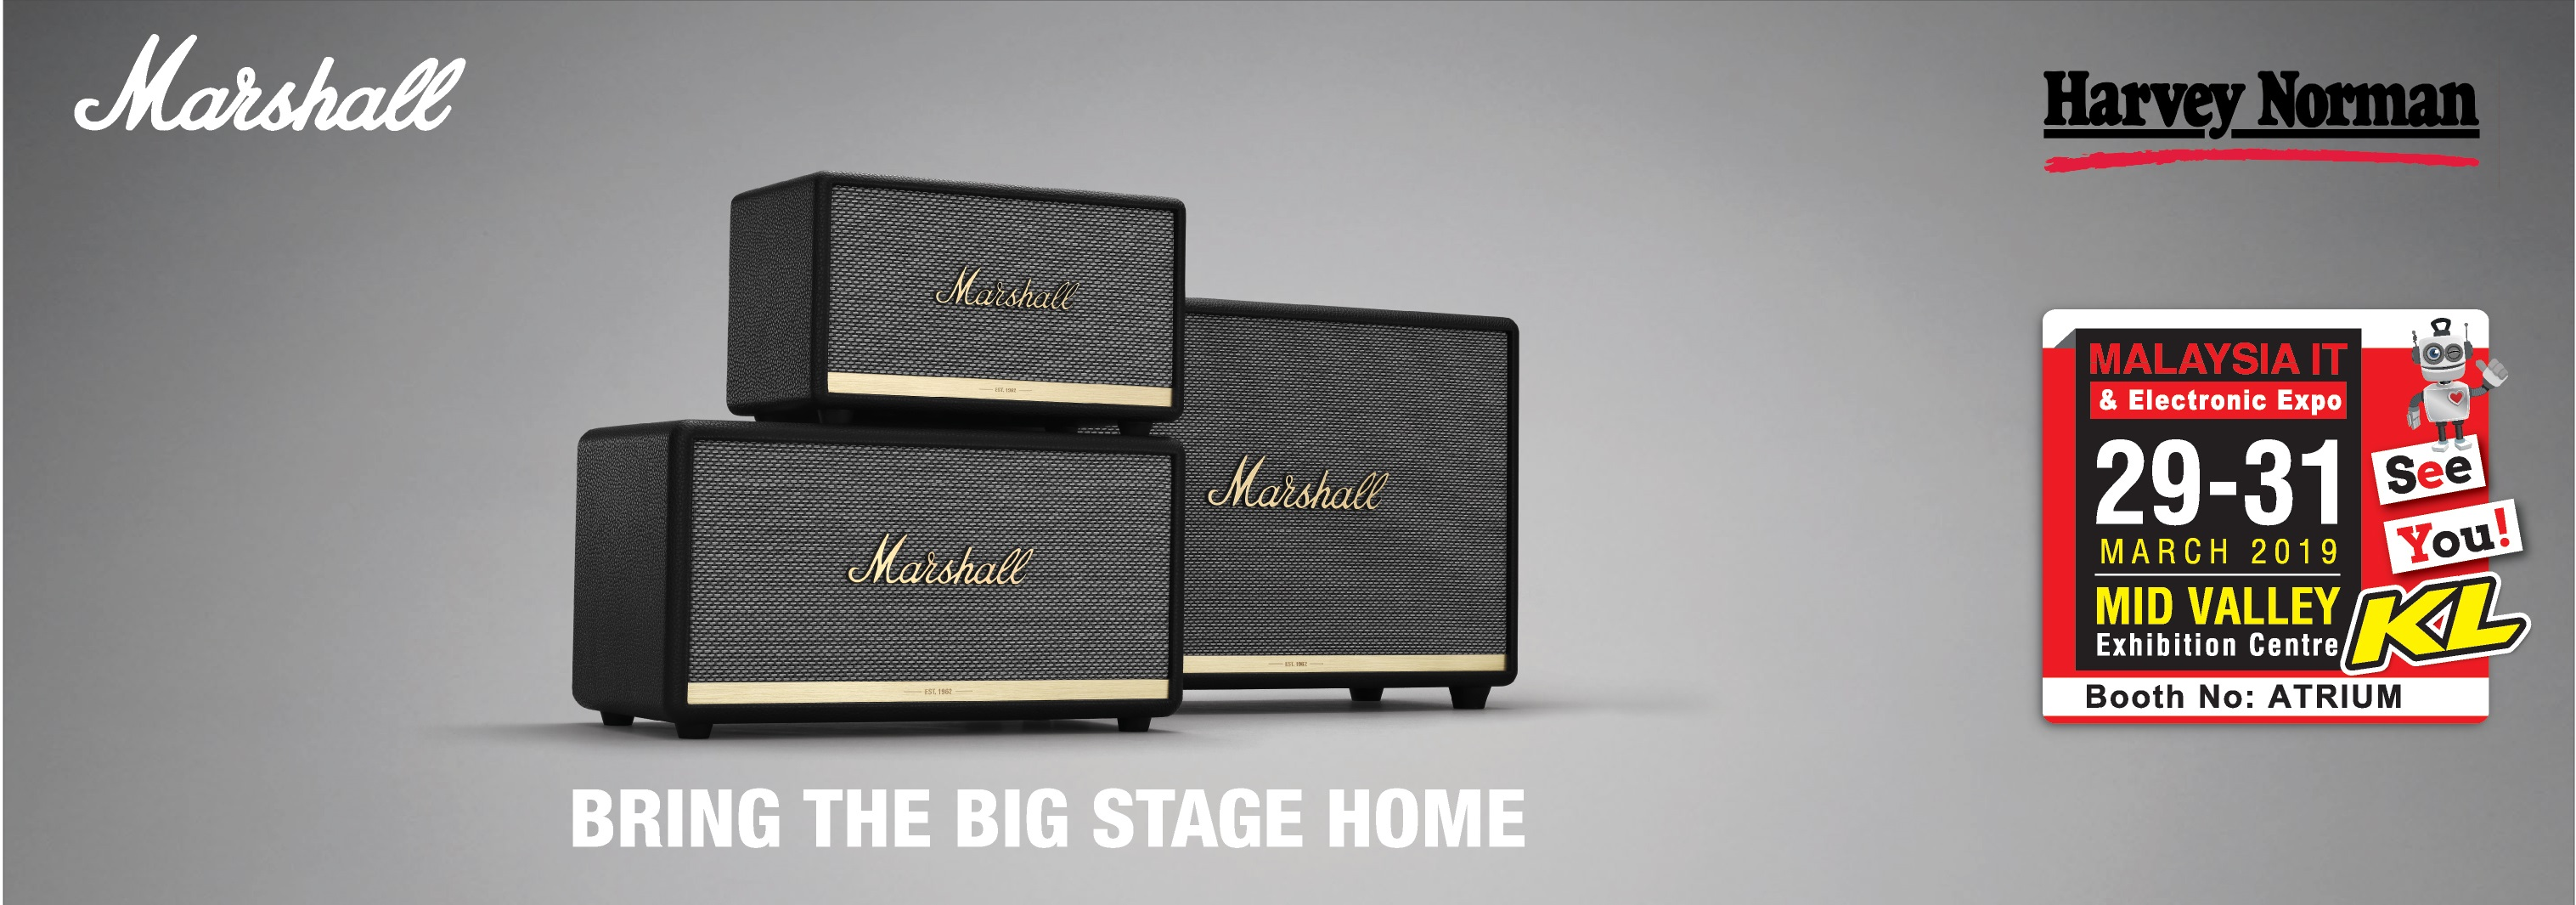 Marshall-MY-740-x-270_